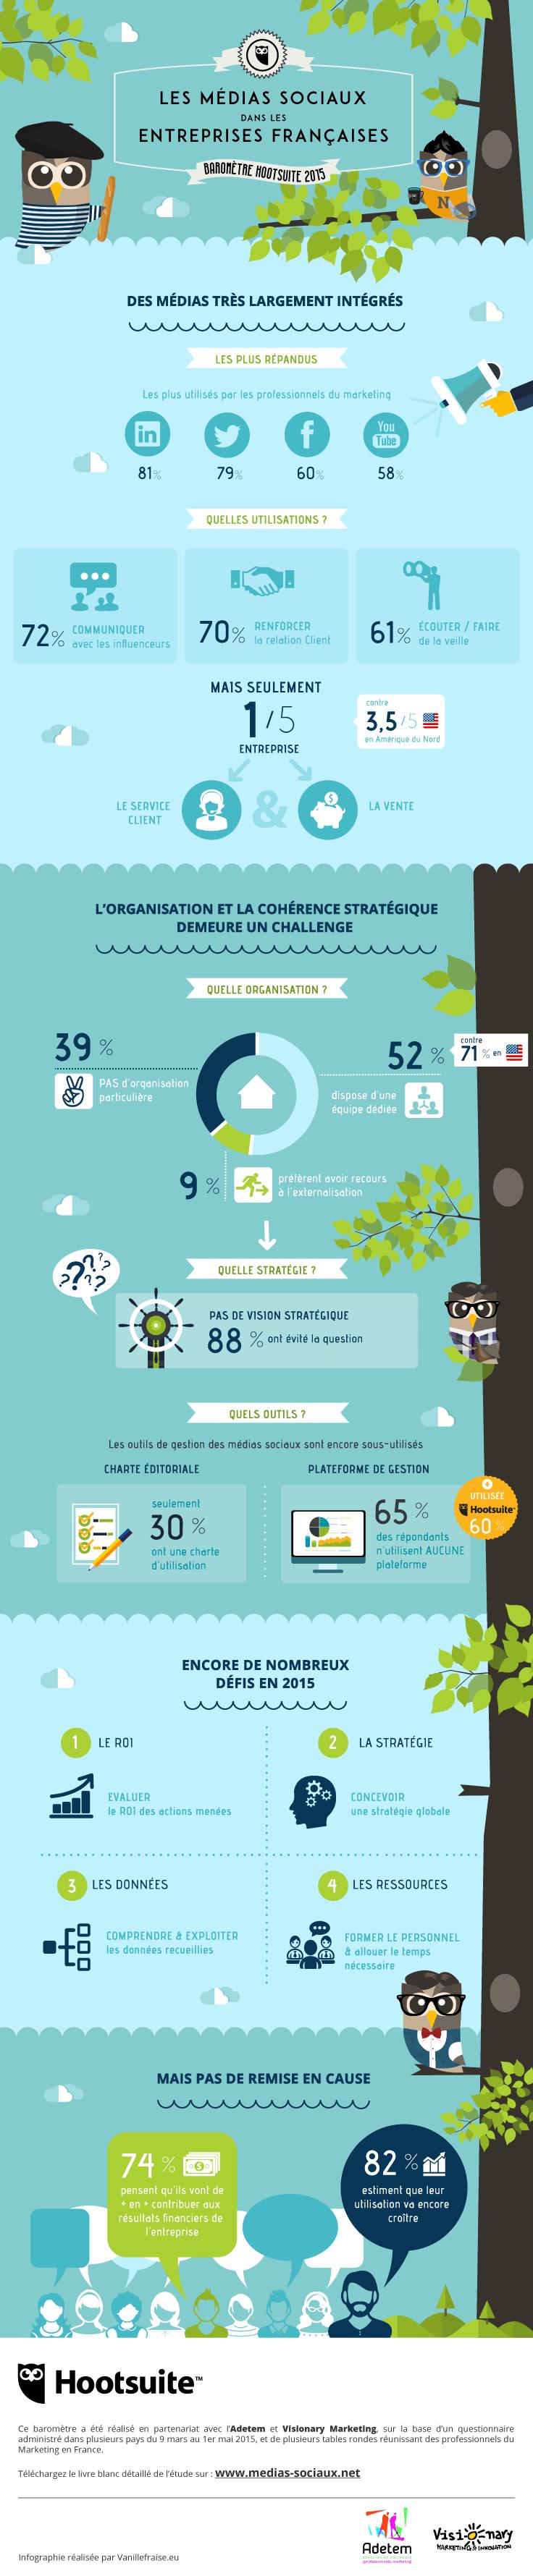 medias-sociaux-france-2015